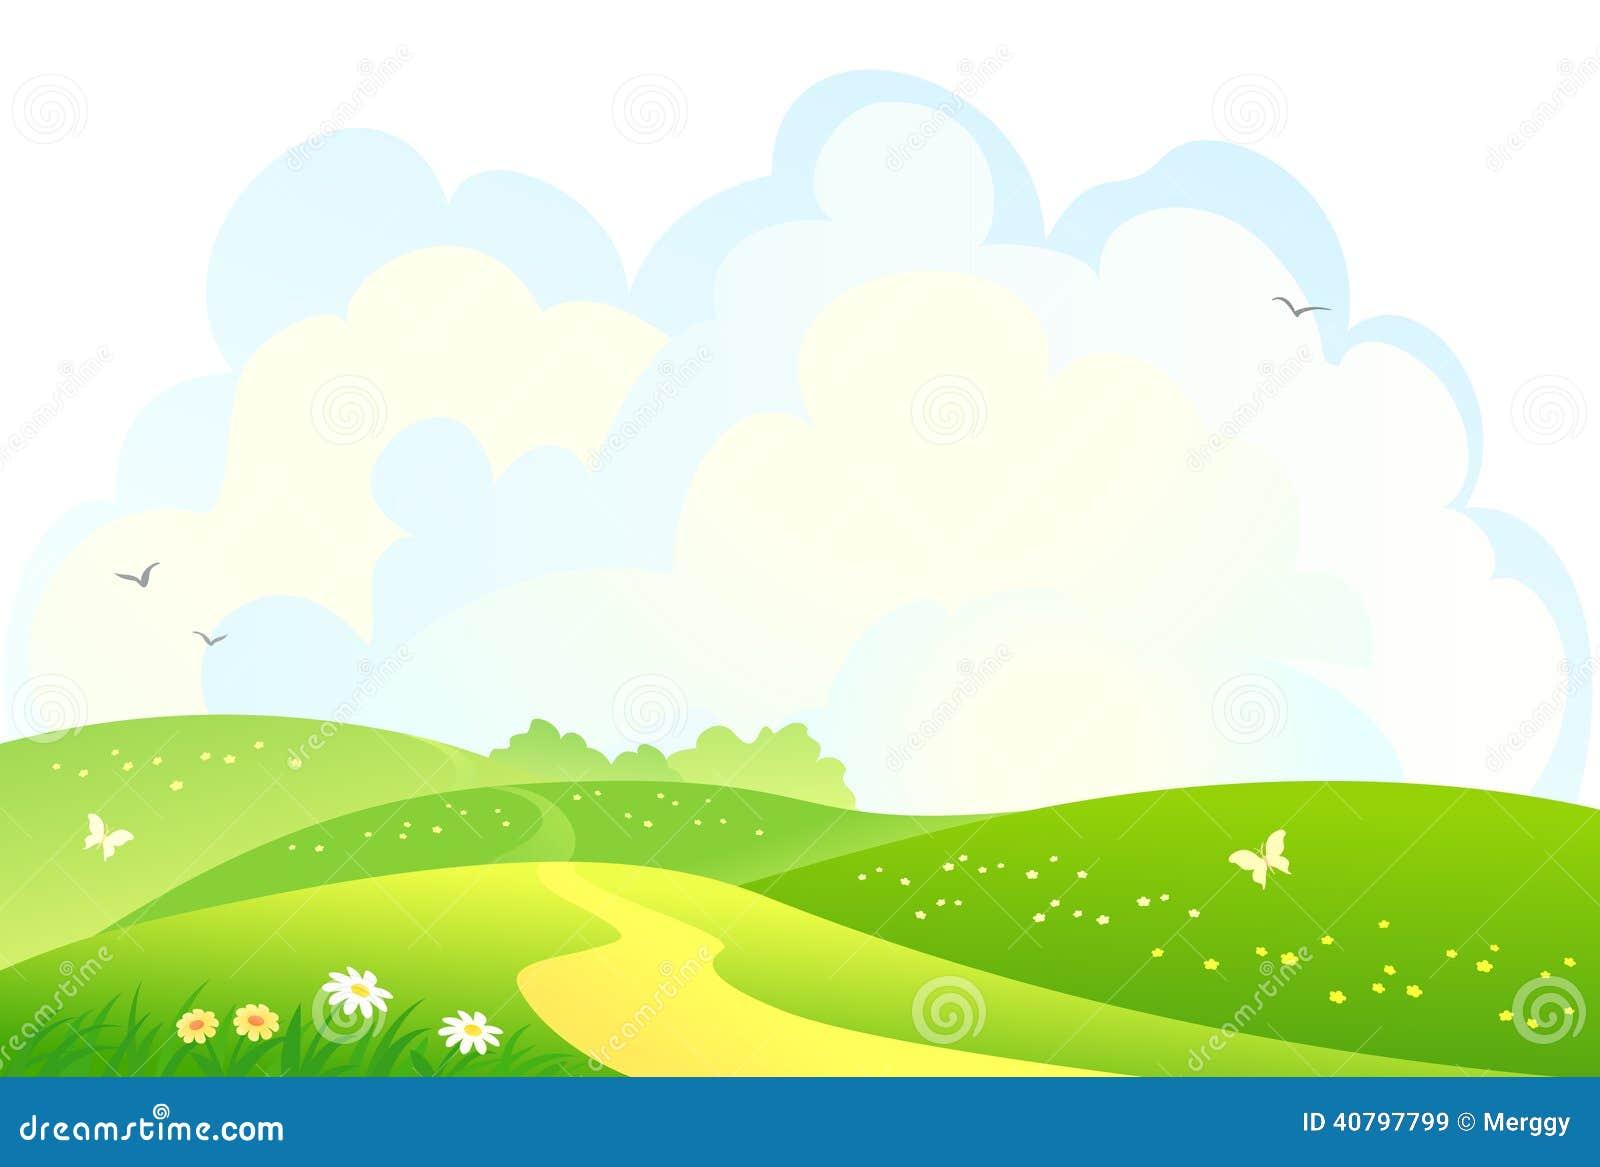 Green Hills Background Stock Vector - Image: 40797799